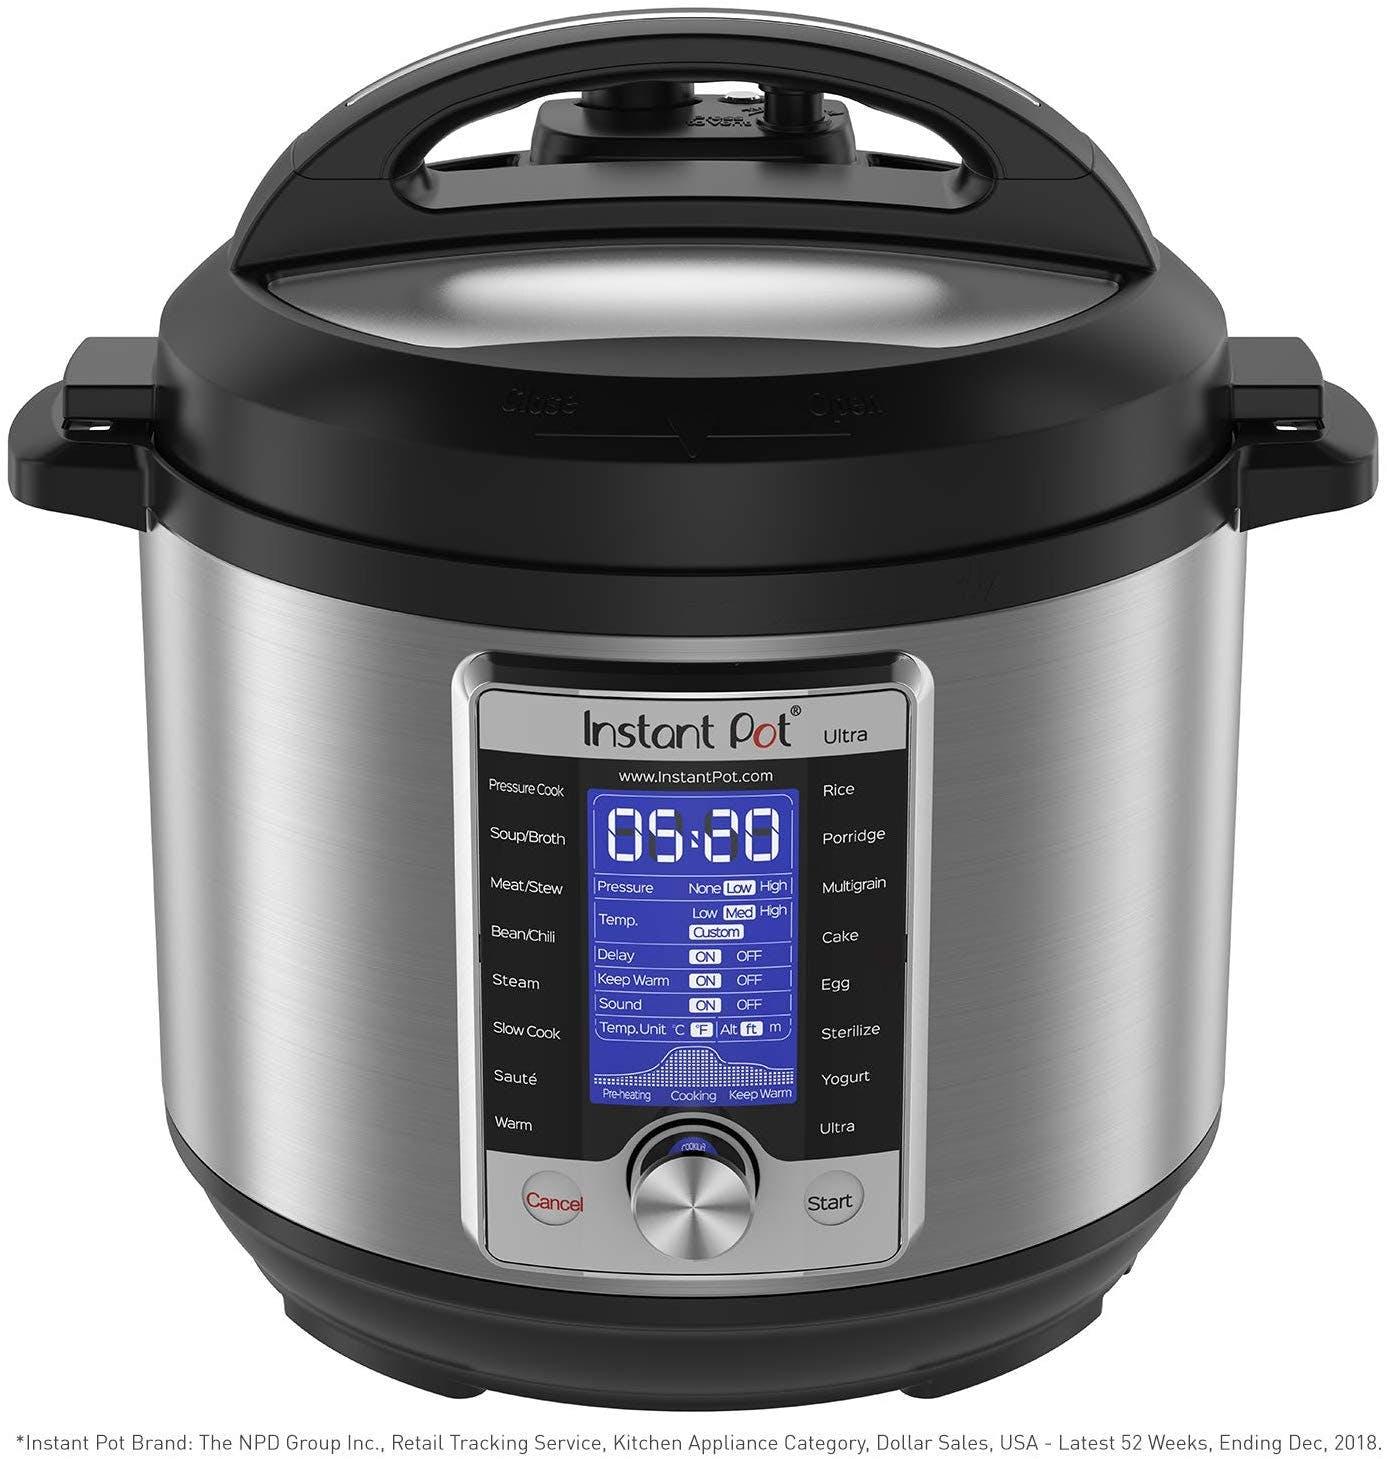 black Friday kitchen deals 2019 Instant Pot